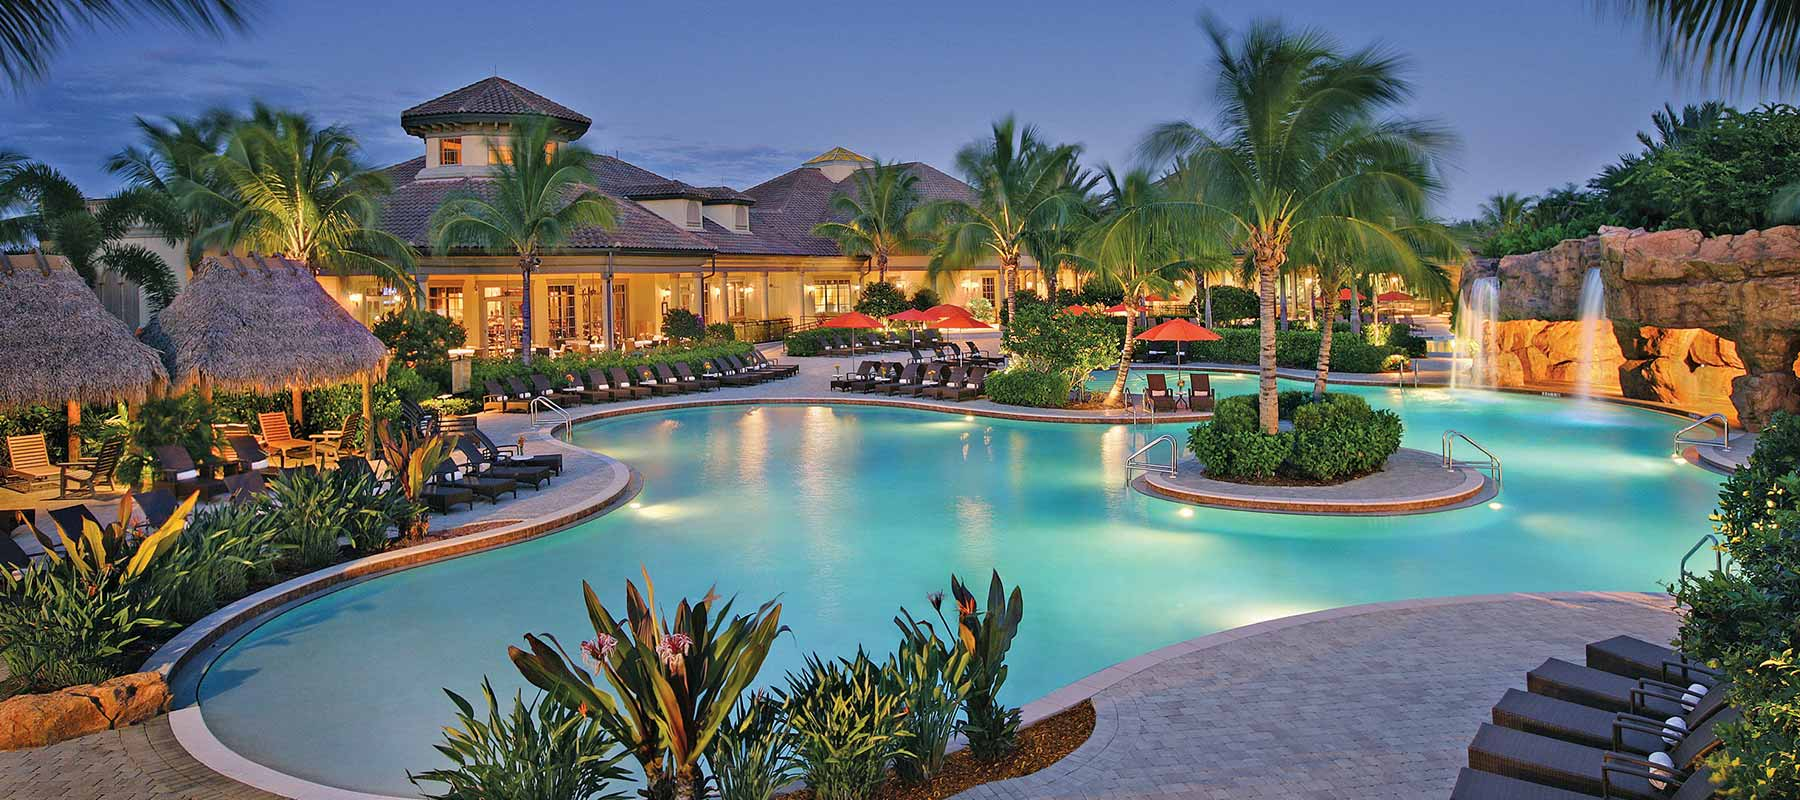 South Naples FL Real Estate   Neighborhoods & Homes For Sale